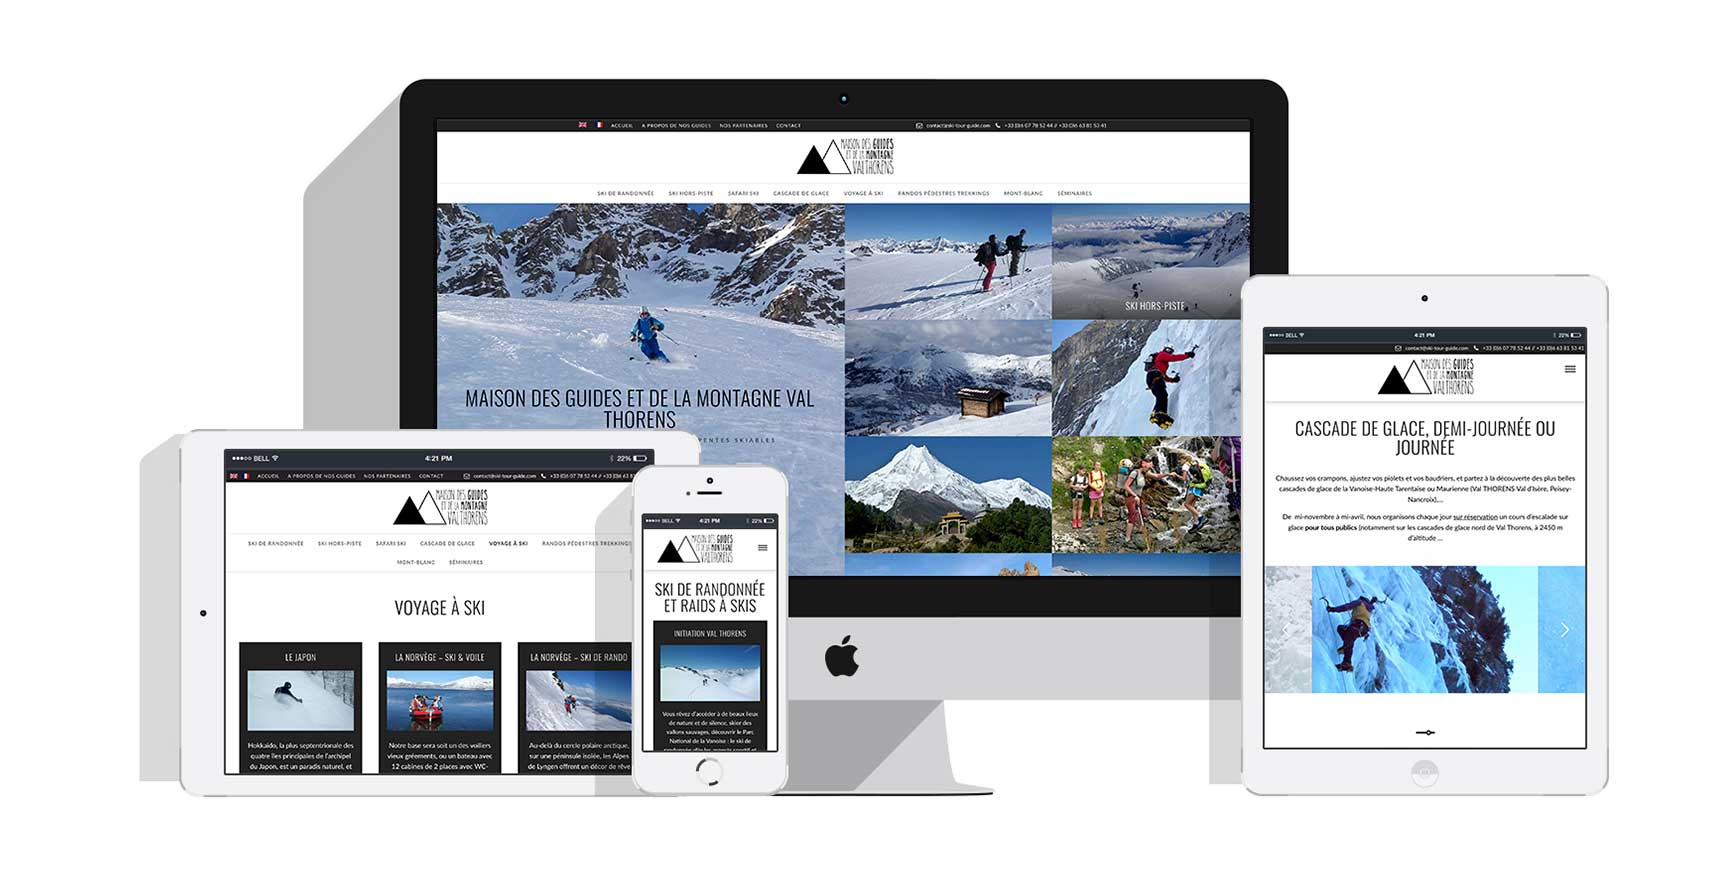 portfolio-ski-tour-guide-florence-borrel-flobo-design-graphique-infographie-webdesign-savoie-tarentaise-meribel-menuires-courchevel